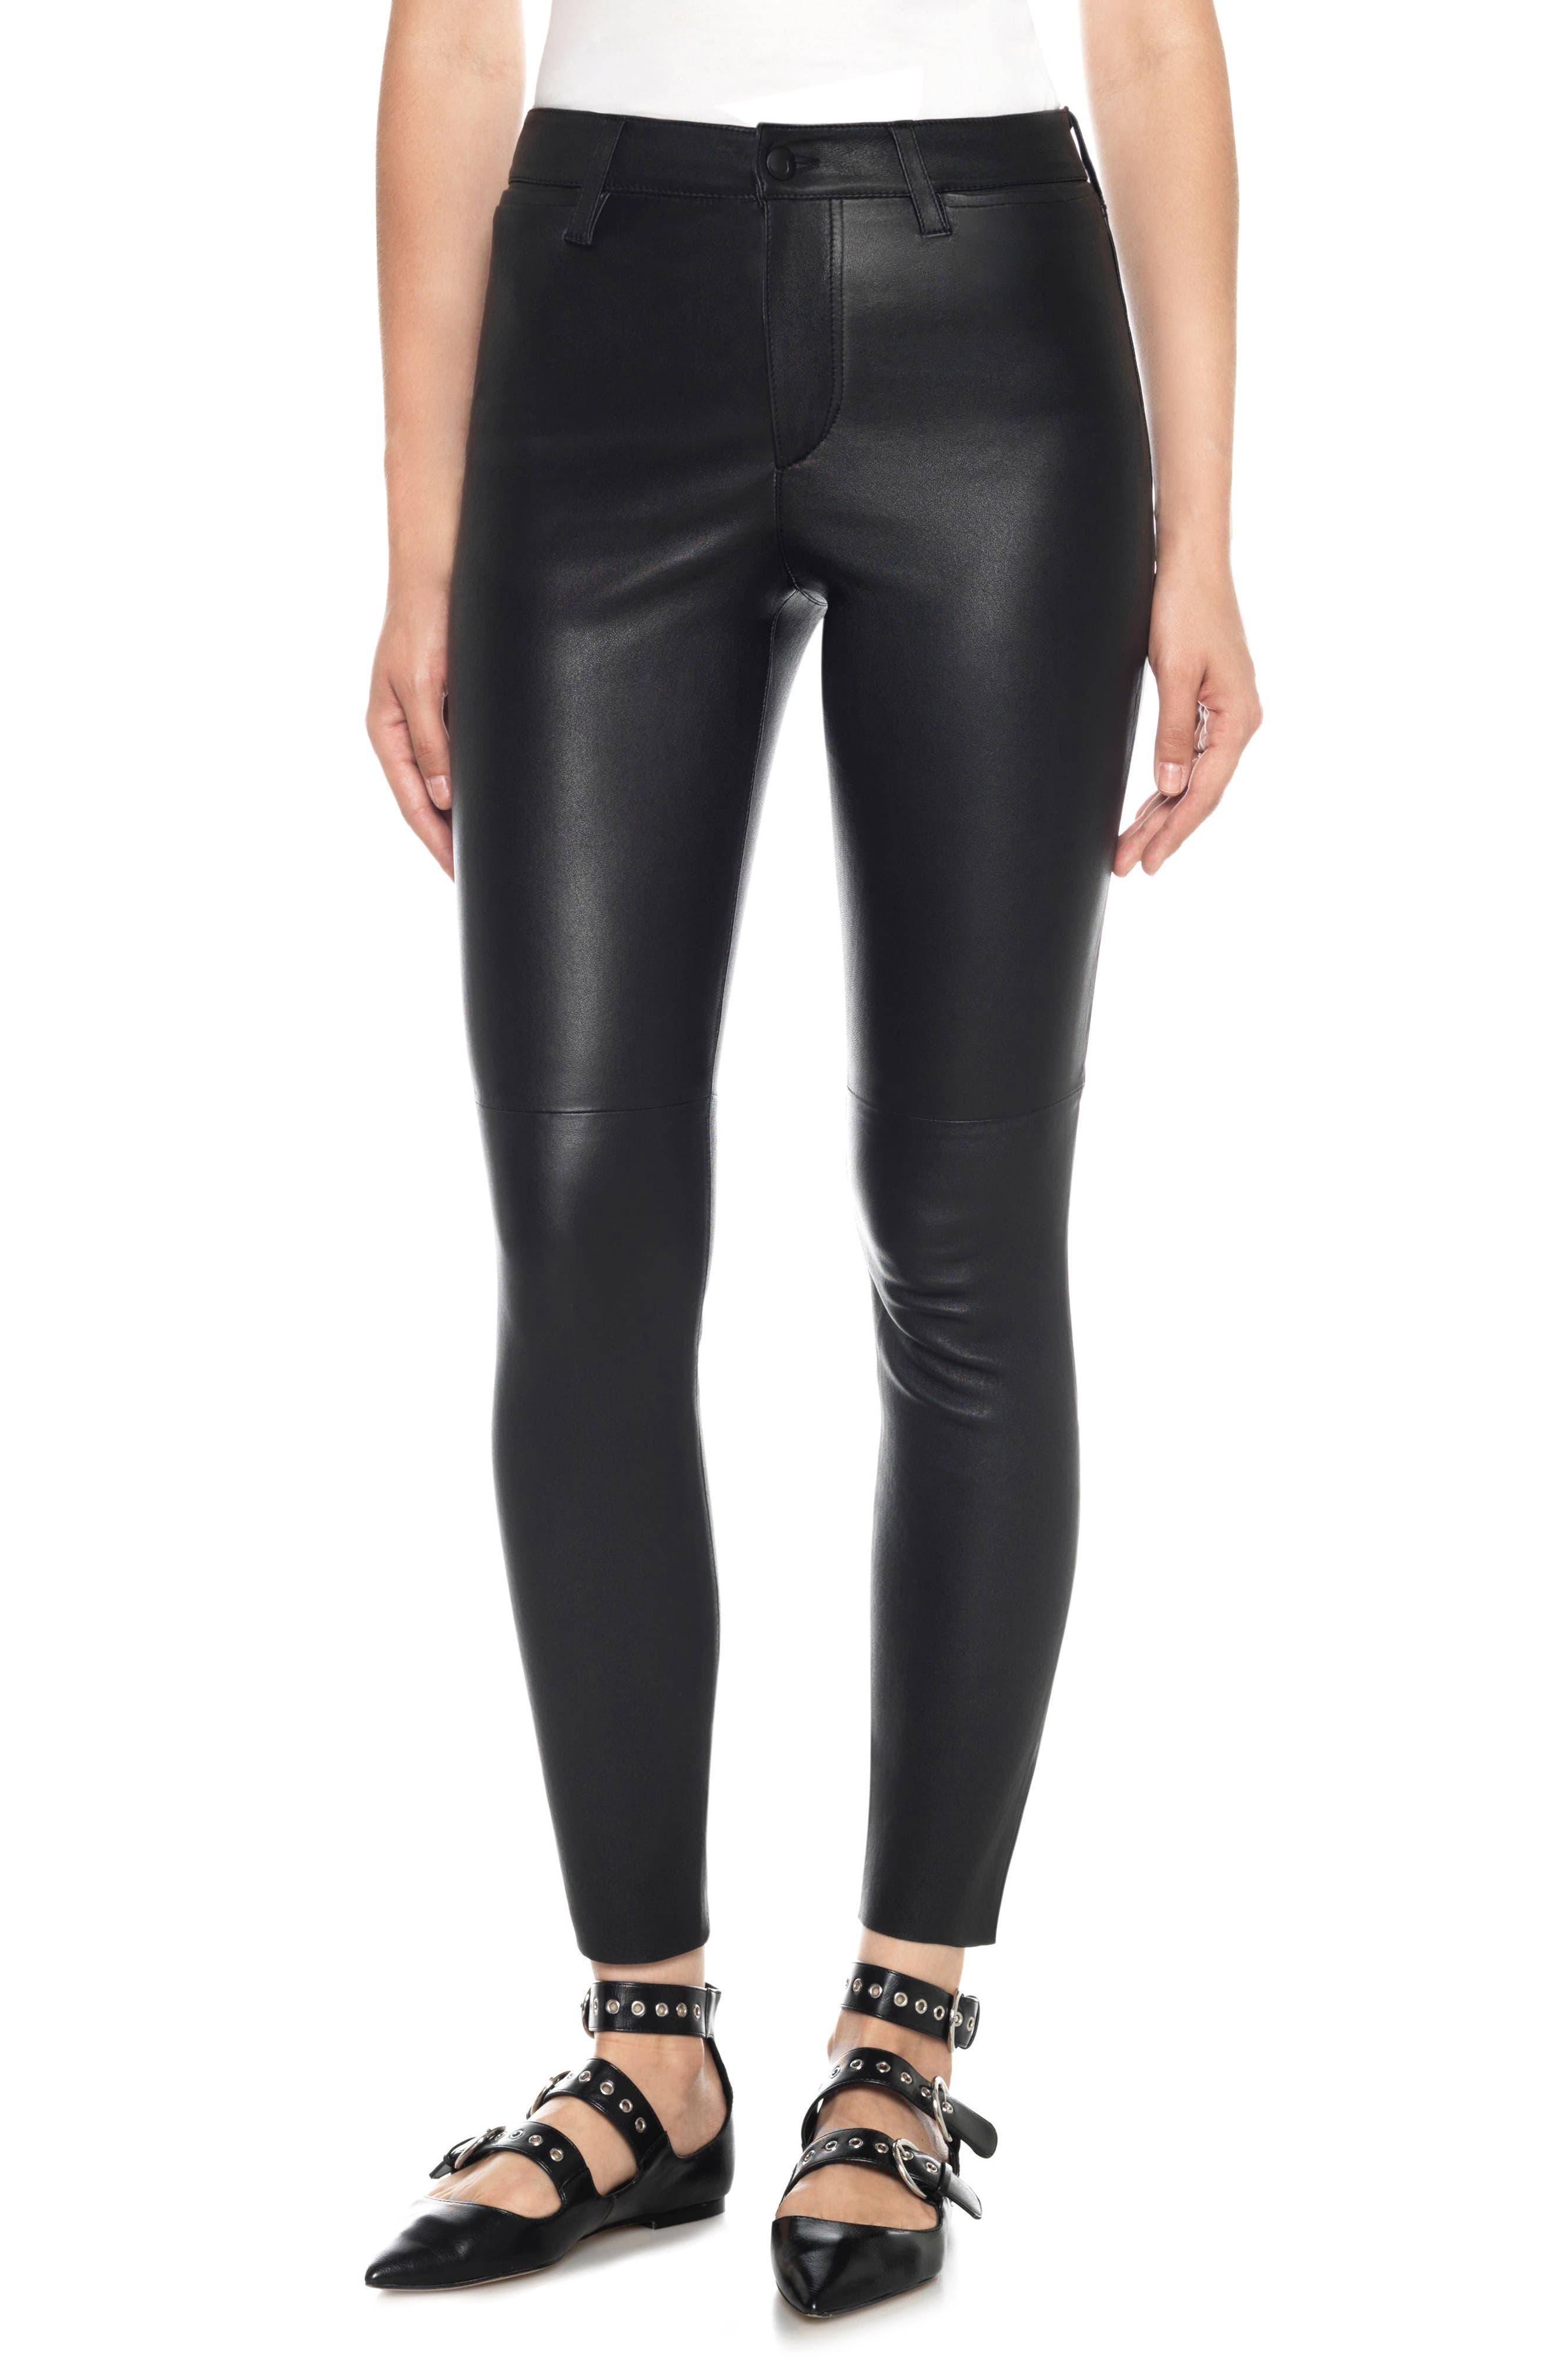 Alternate Image 1 Selected - Joe's Charlie High Waist Ankle Skinny Leather Jeans